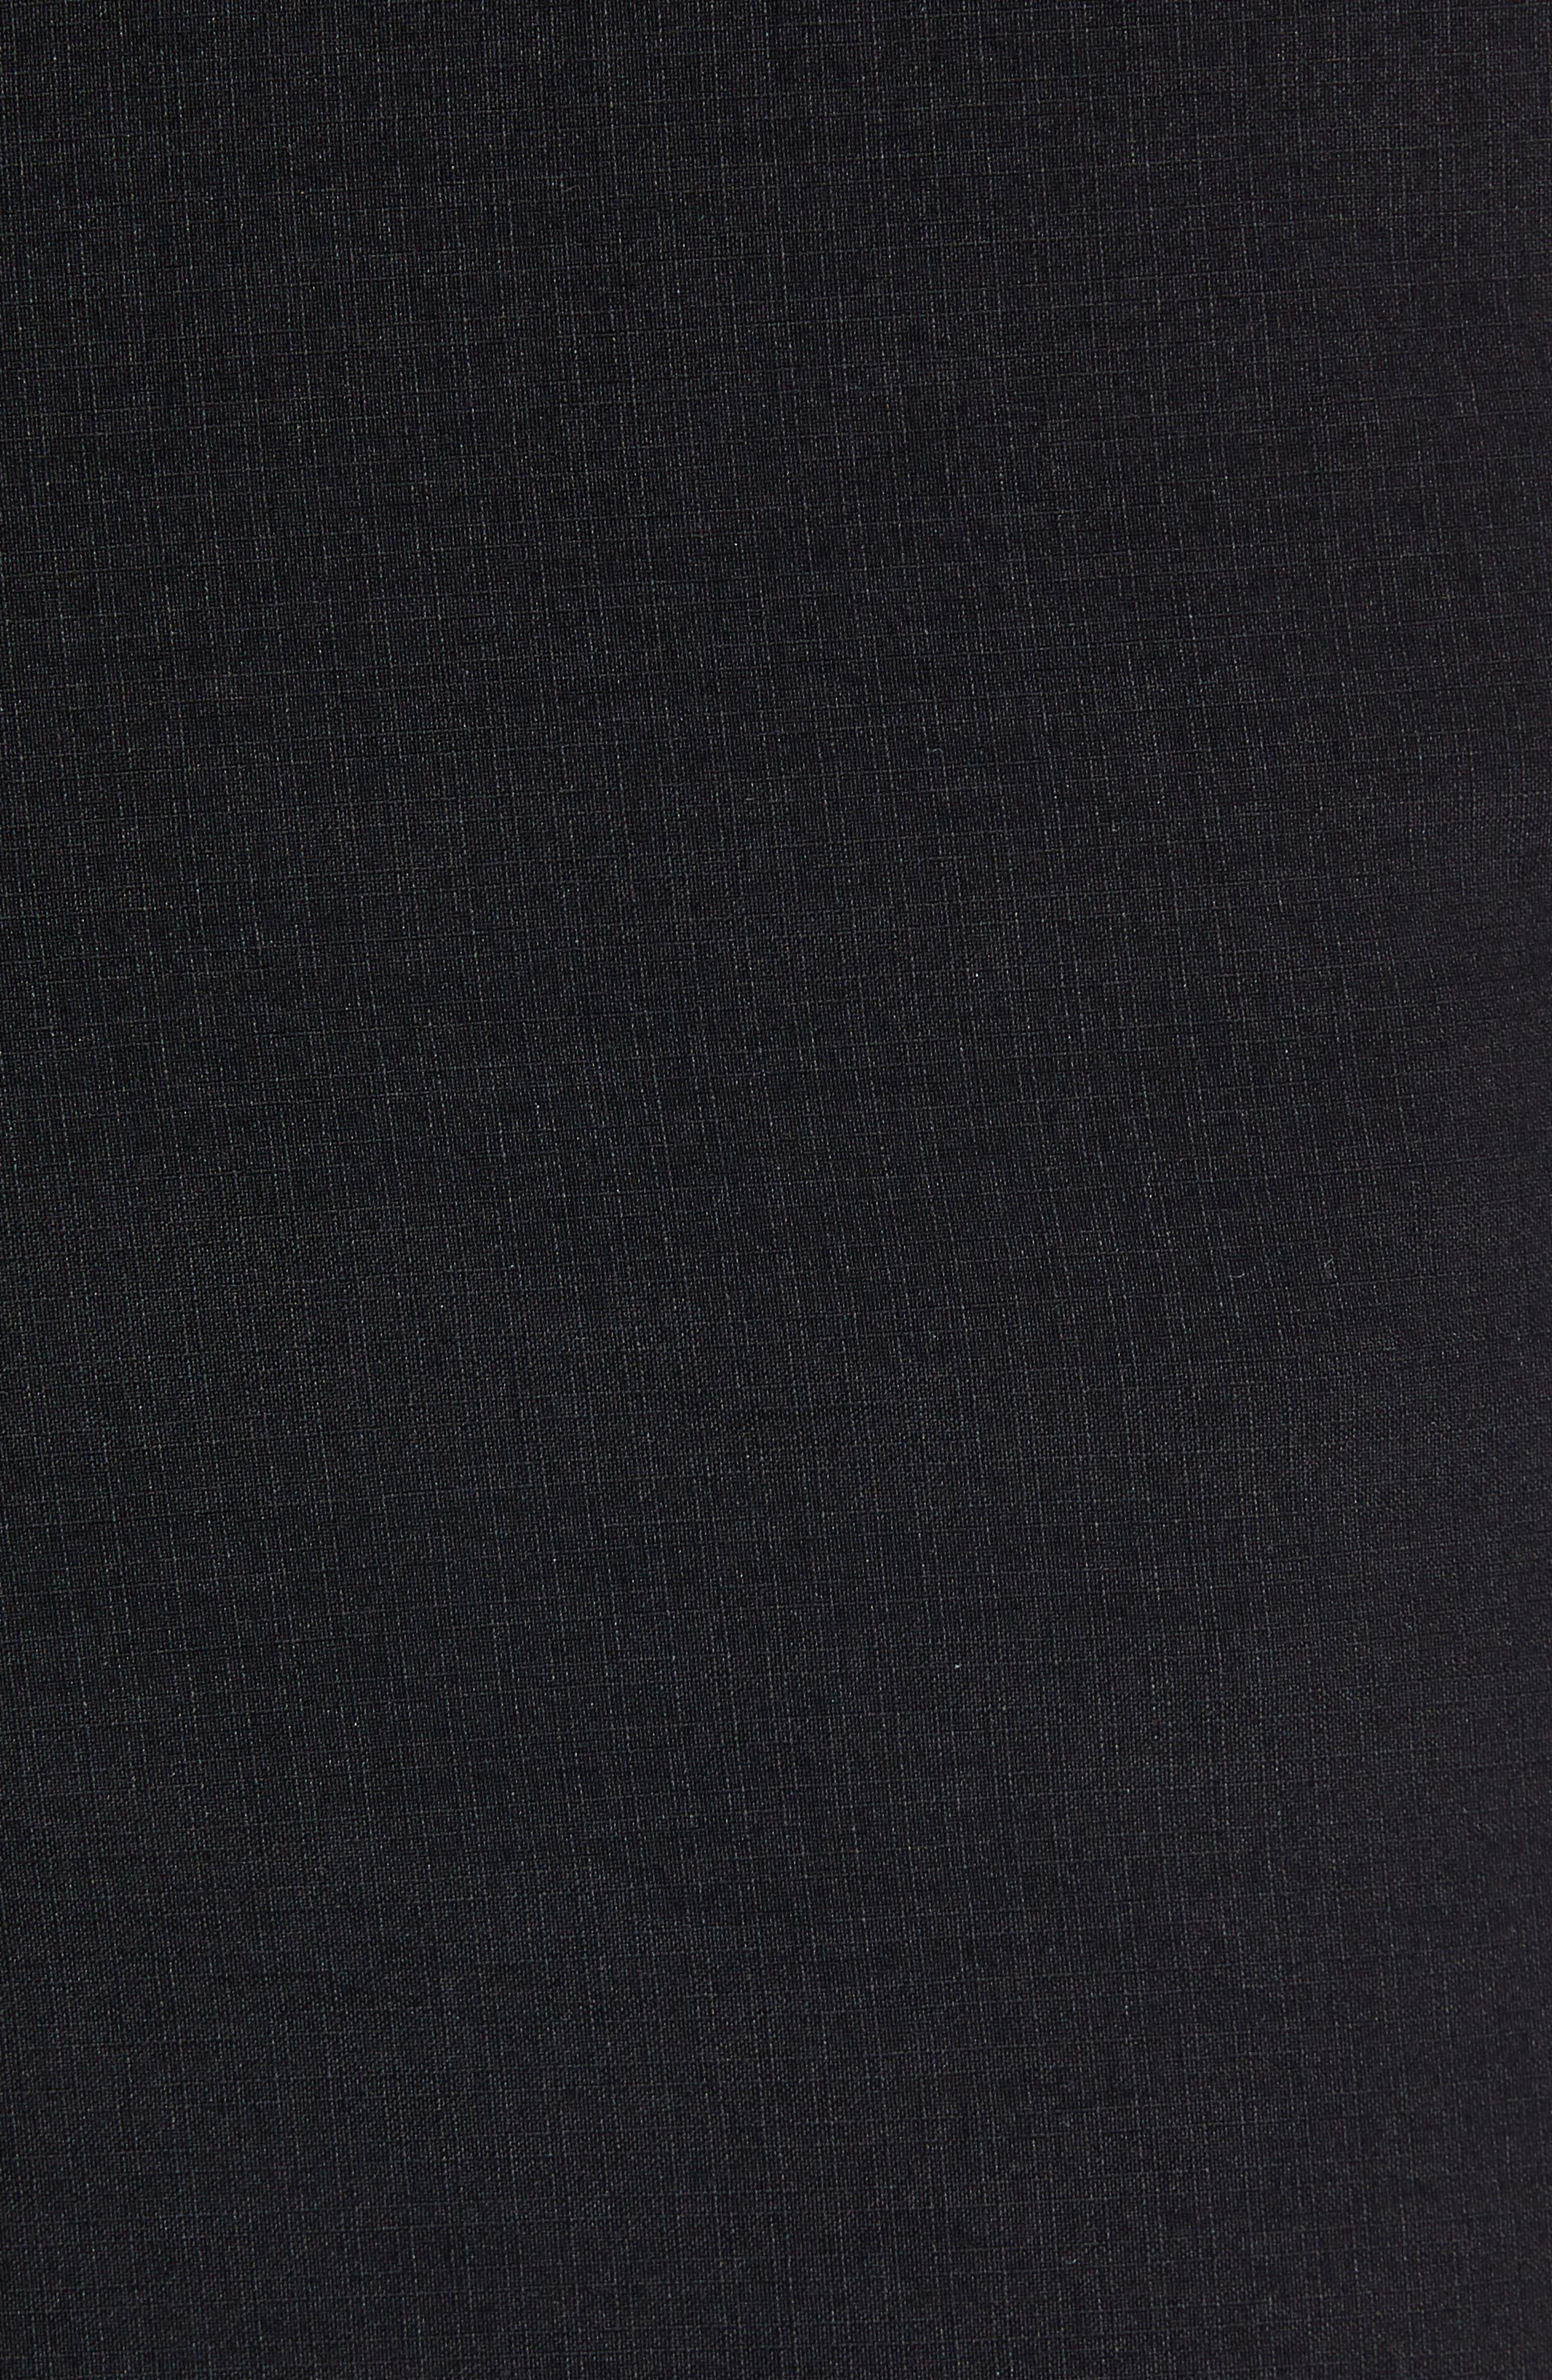 Surfreak Hybrid Shorts,                             Alternate thumbnail 5, color,                             BLACK